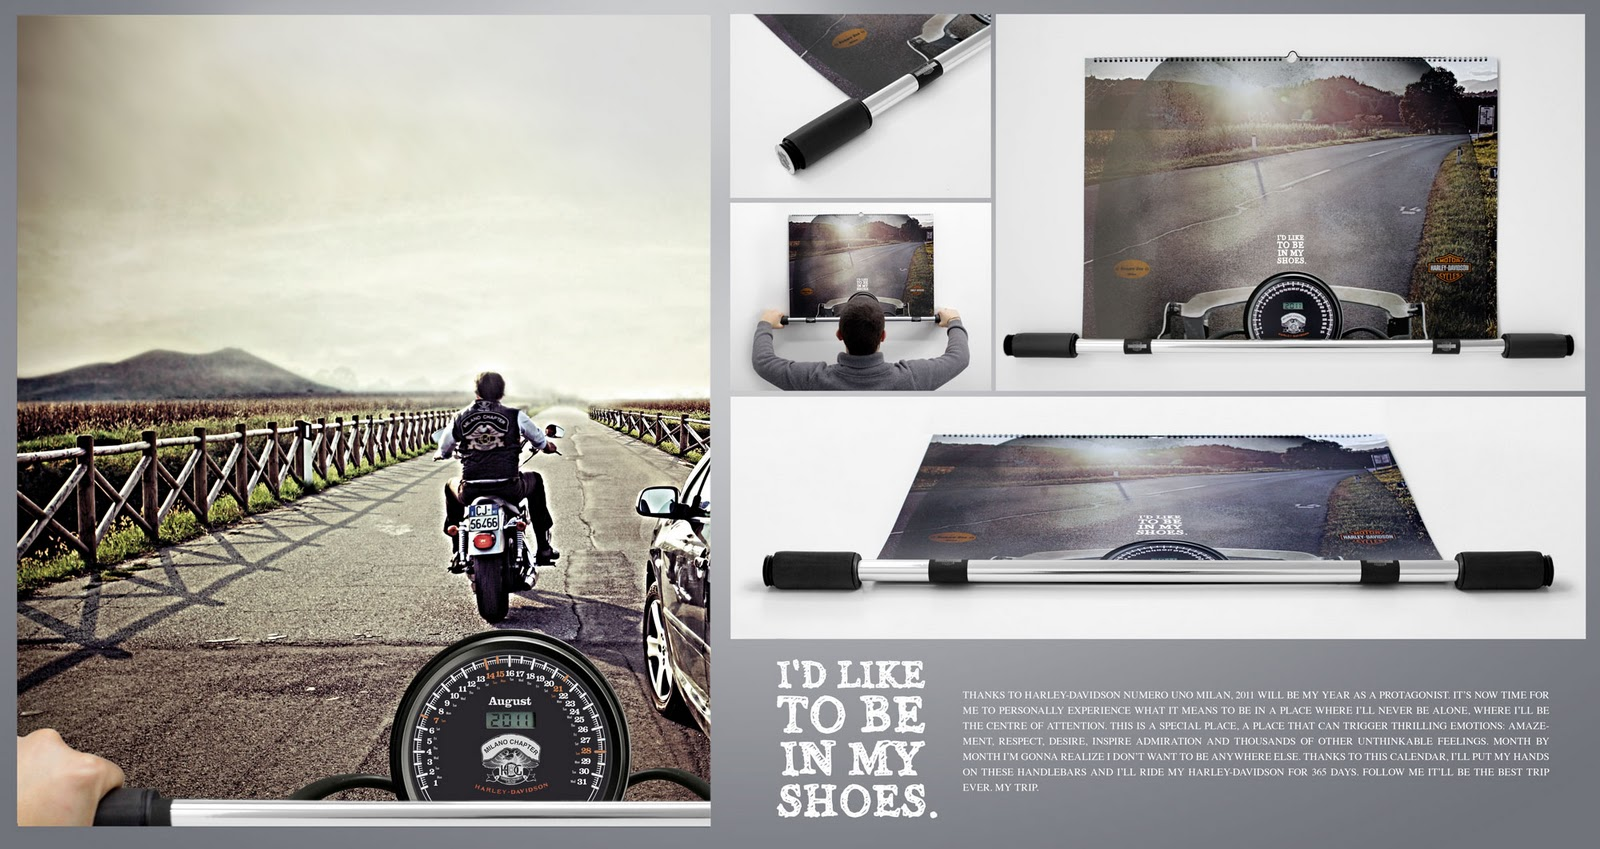 http://2.bp.blogspot.com/_0td8w9kws5w/TQi39kei9OI/AAAAAAAAAe0/A4MRO8B3i8E/s1600/Harley-Davidson%2B-handle%2Bbars%2Bcalendar.jpg